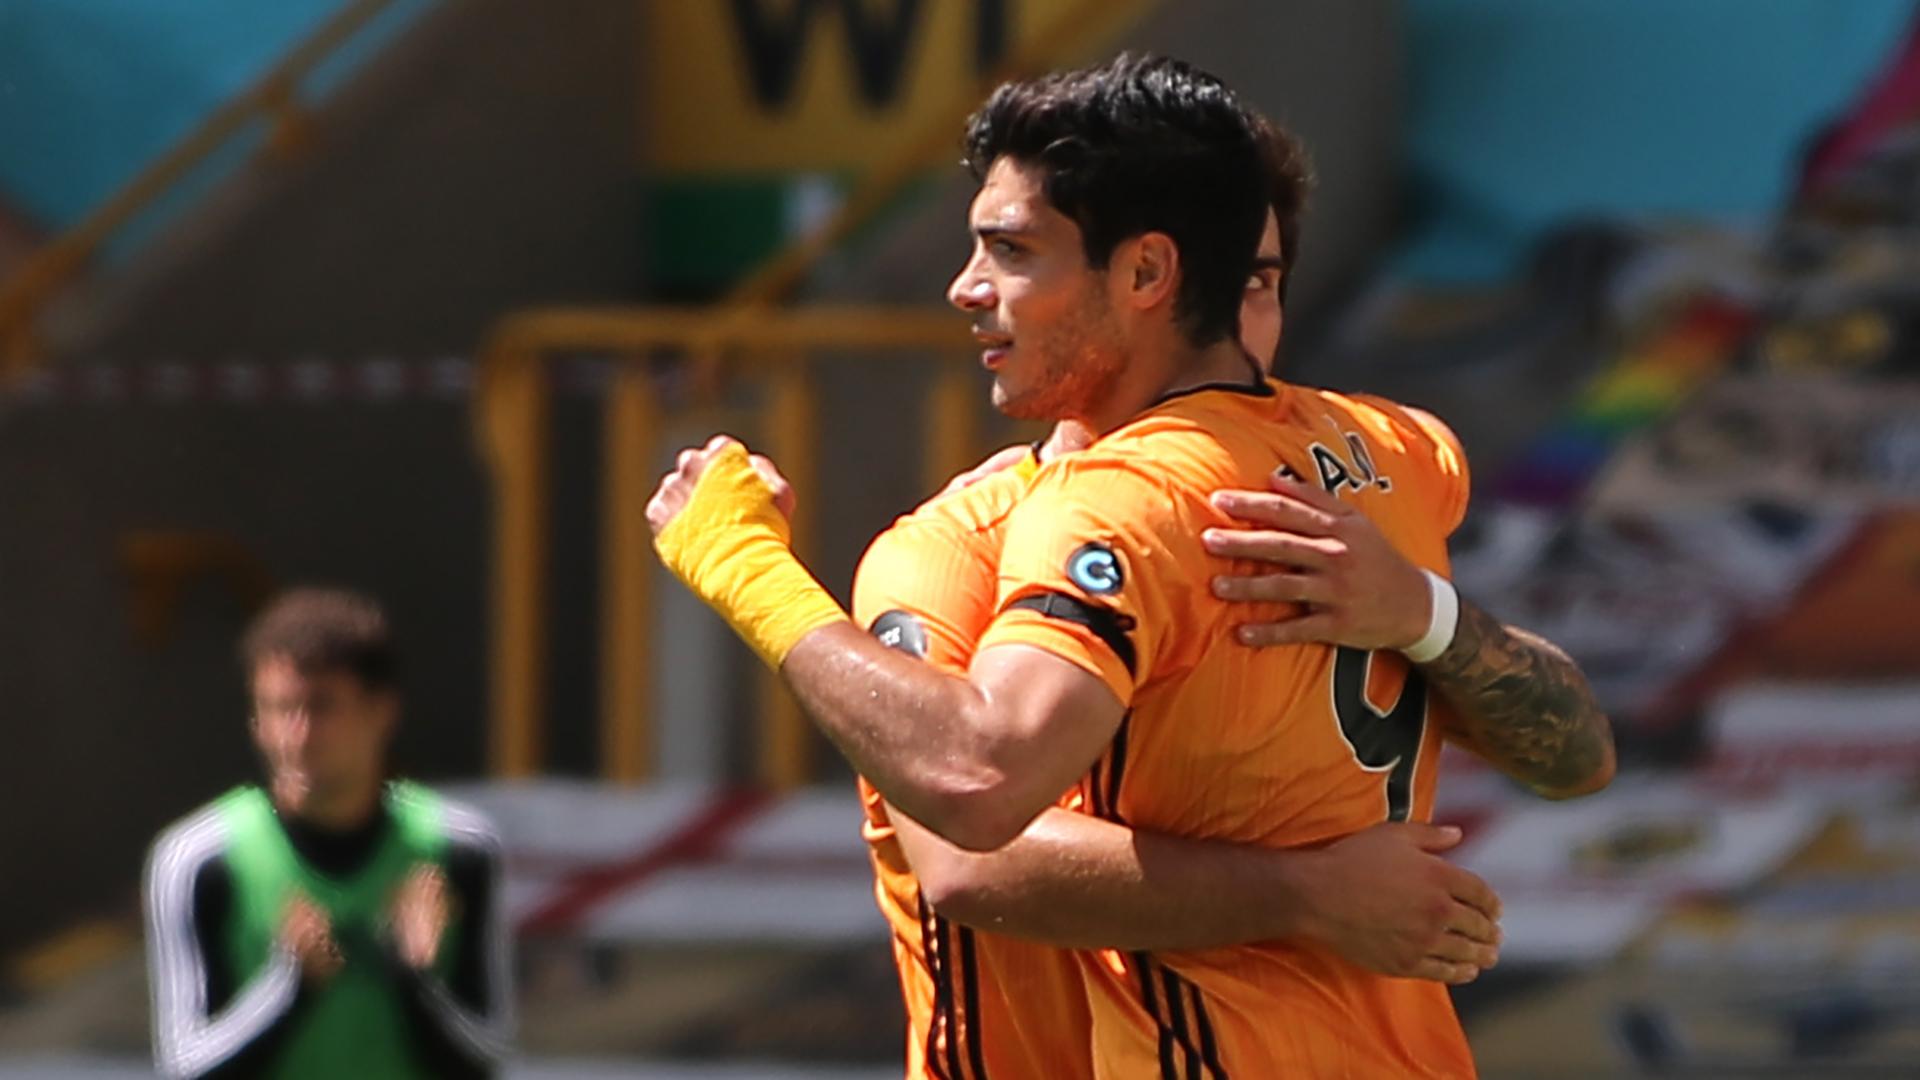 Wolves' Jimenez on target to match Yaya Toure's Premier League record